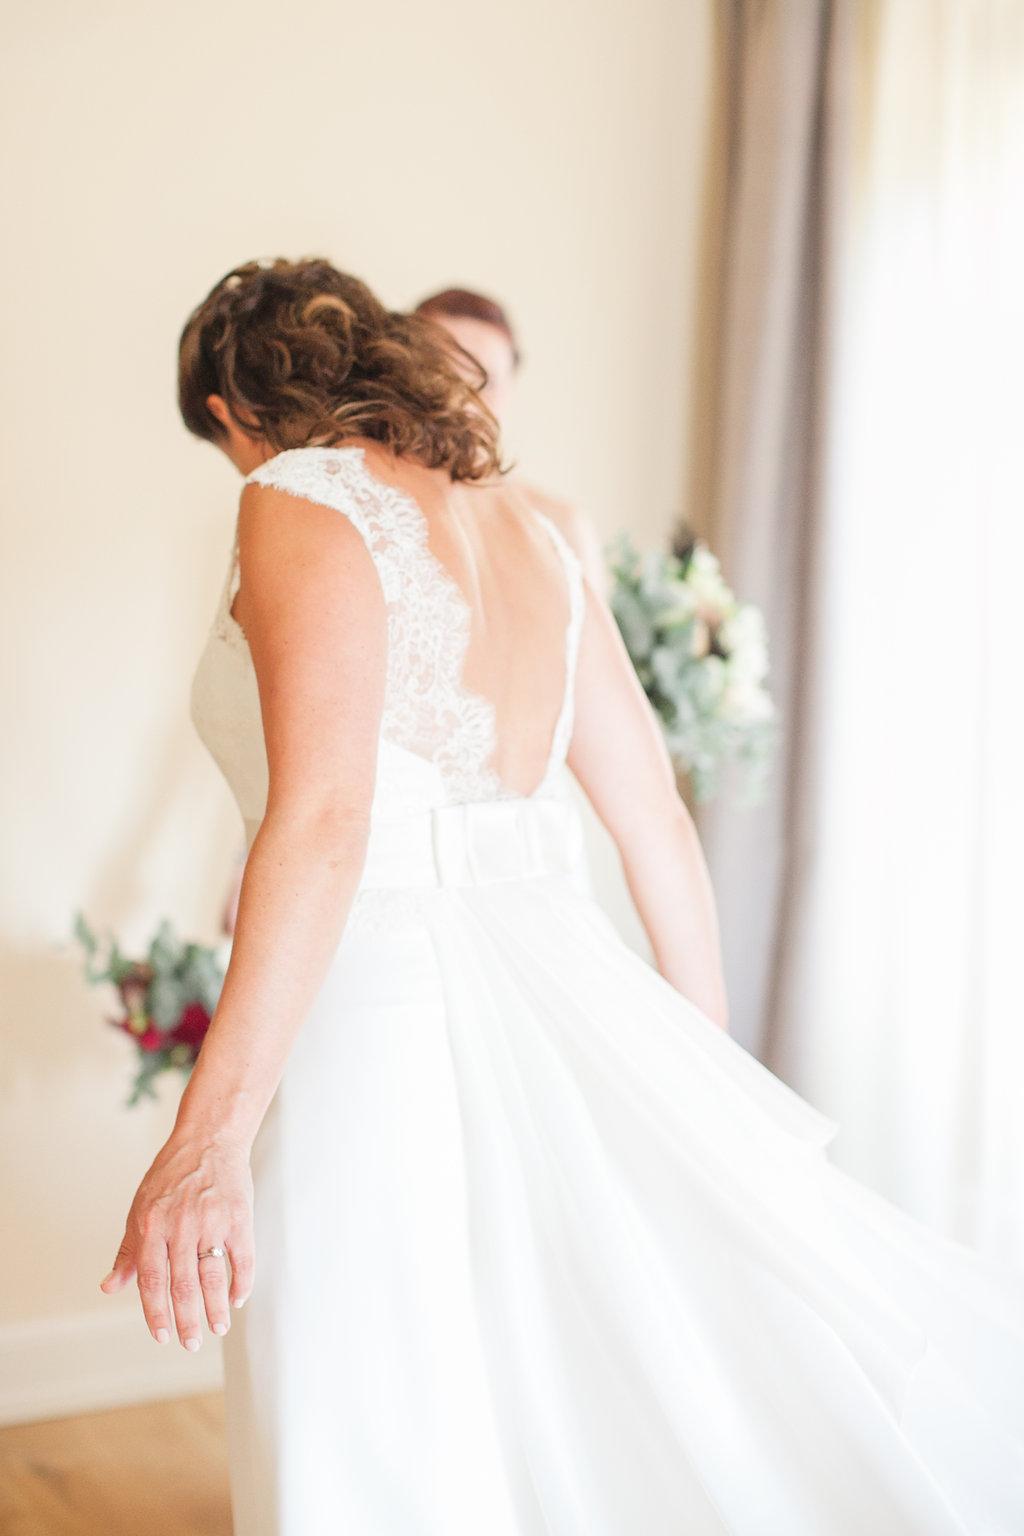 castelfalfi-tuscany-wedding-photographer-roberta-facchini-110